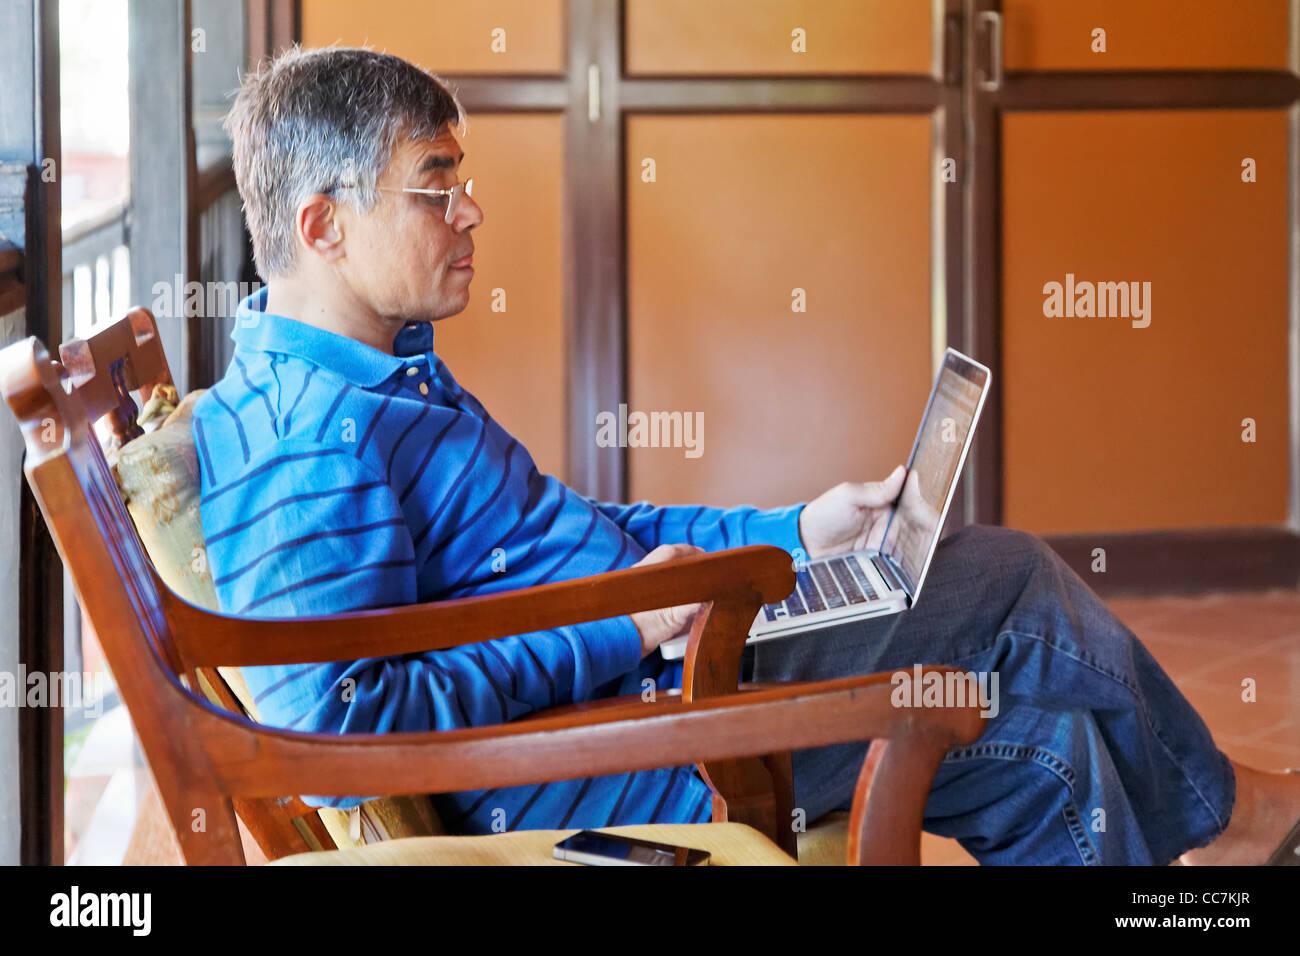 captains chair stockfotos captains chair bilder alamy. Black Bedroom Furniture Sets. Home Design Ideas